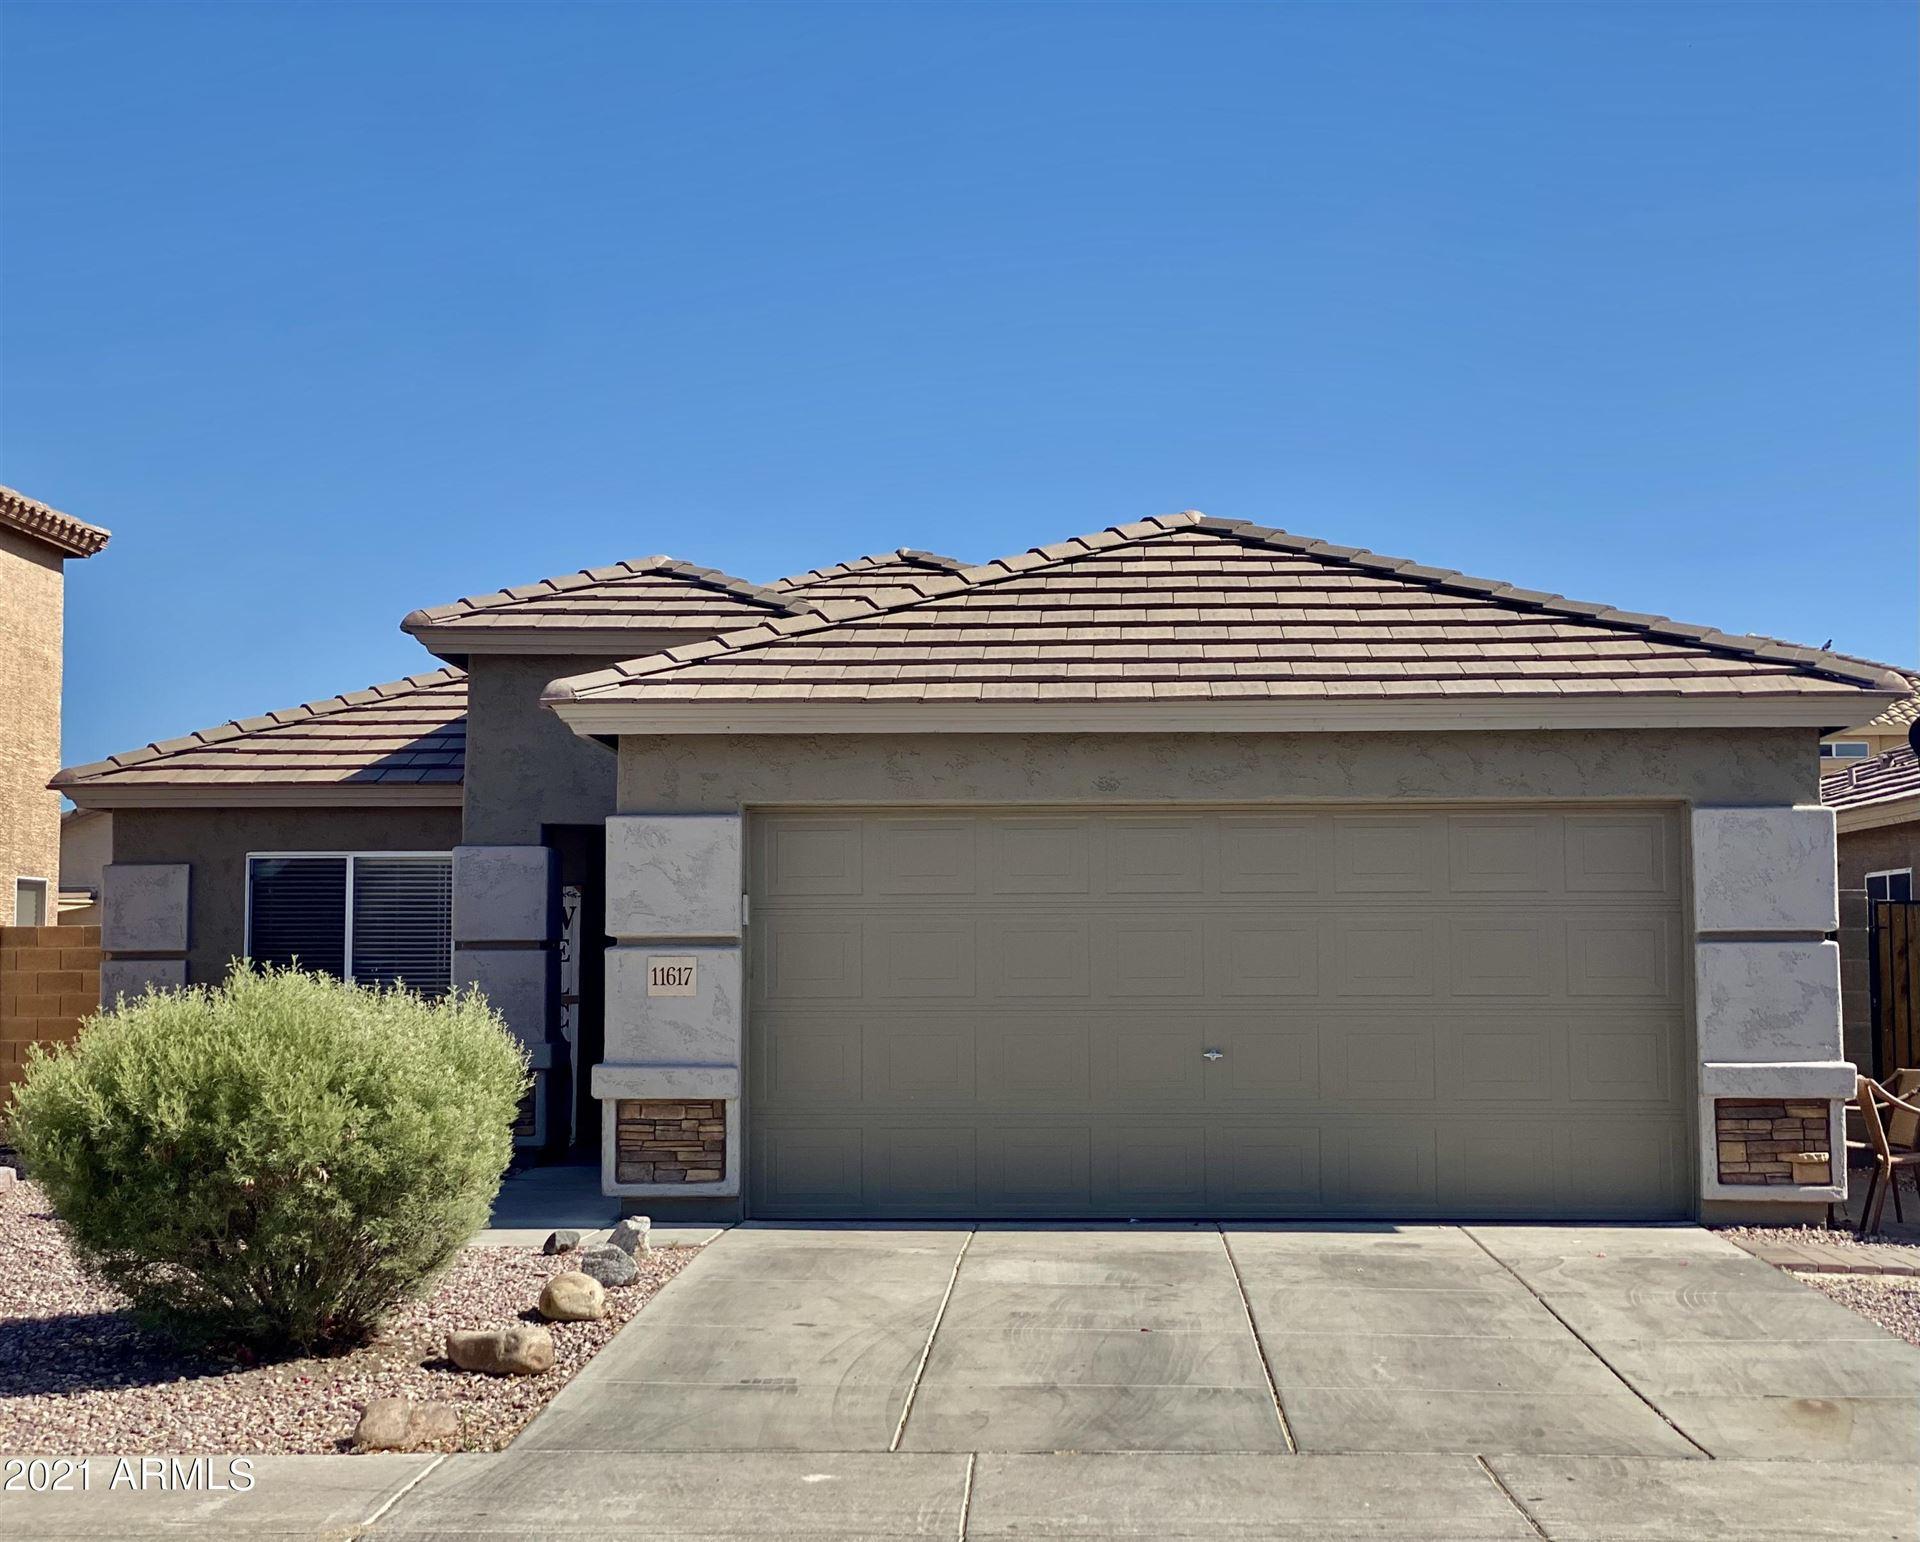 Photo of 11617 W LONGLEY Lane, Youngtown, AZ 85363 (MLS # 6244146)